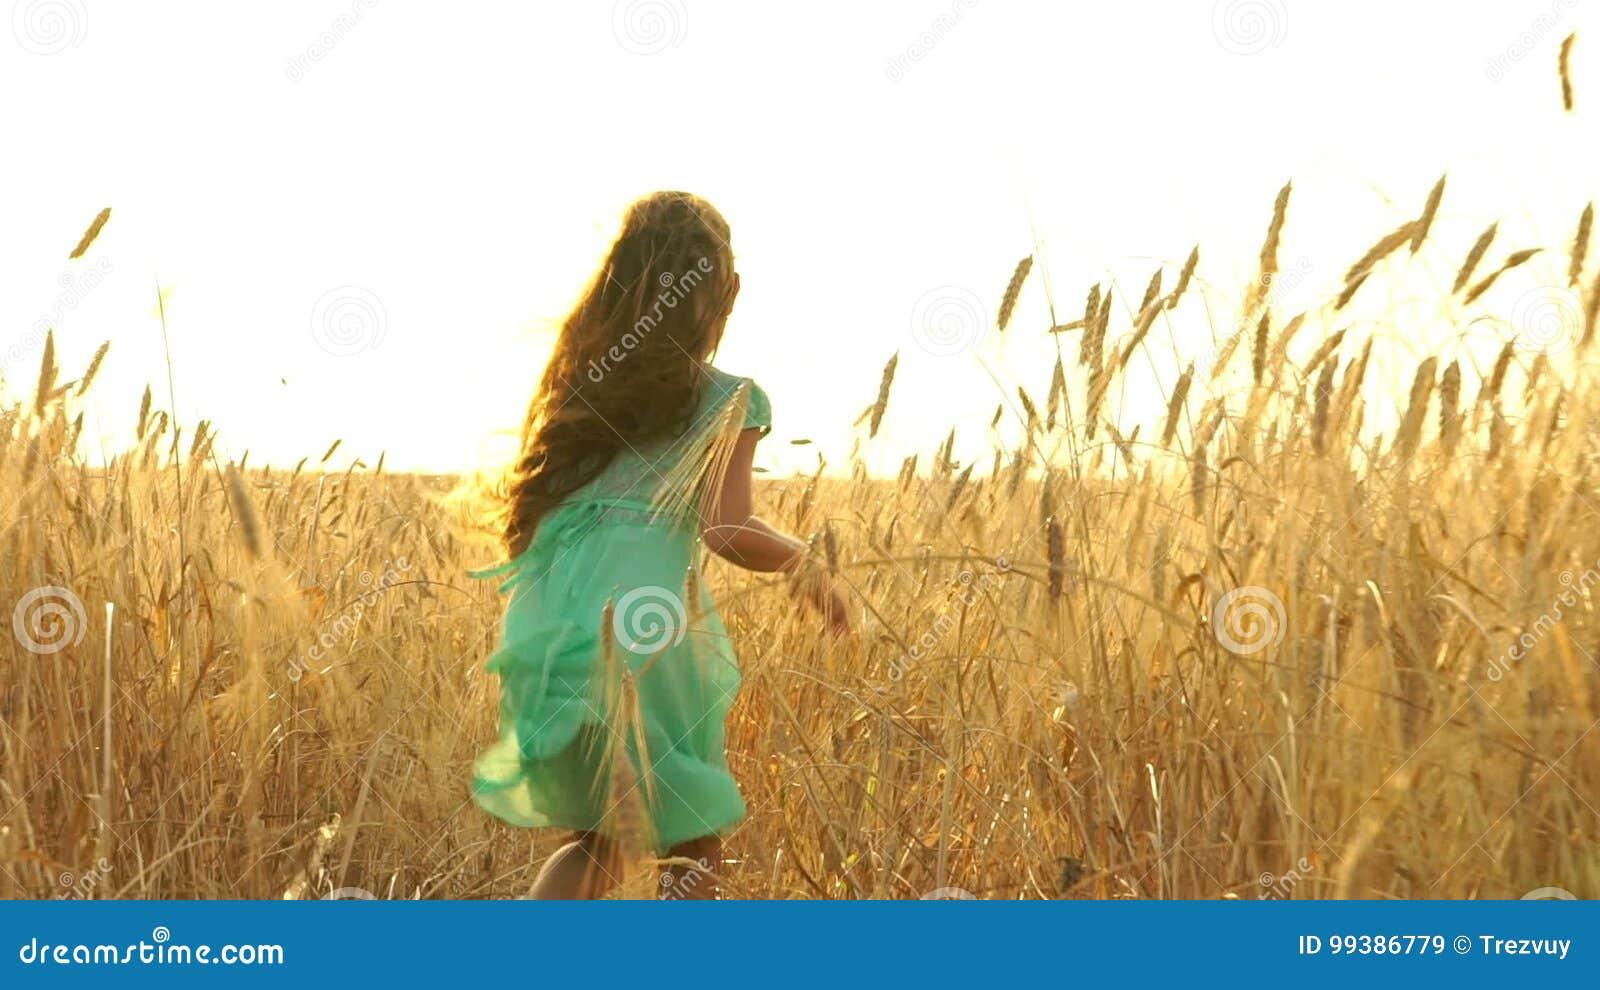 A Menina Bonita No Vestido Esta Correndo Atraves Do Campo Video Estoque Video De Lento Sonhos 99386779